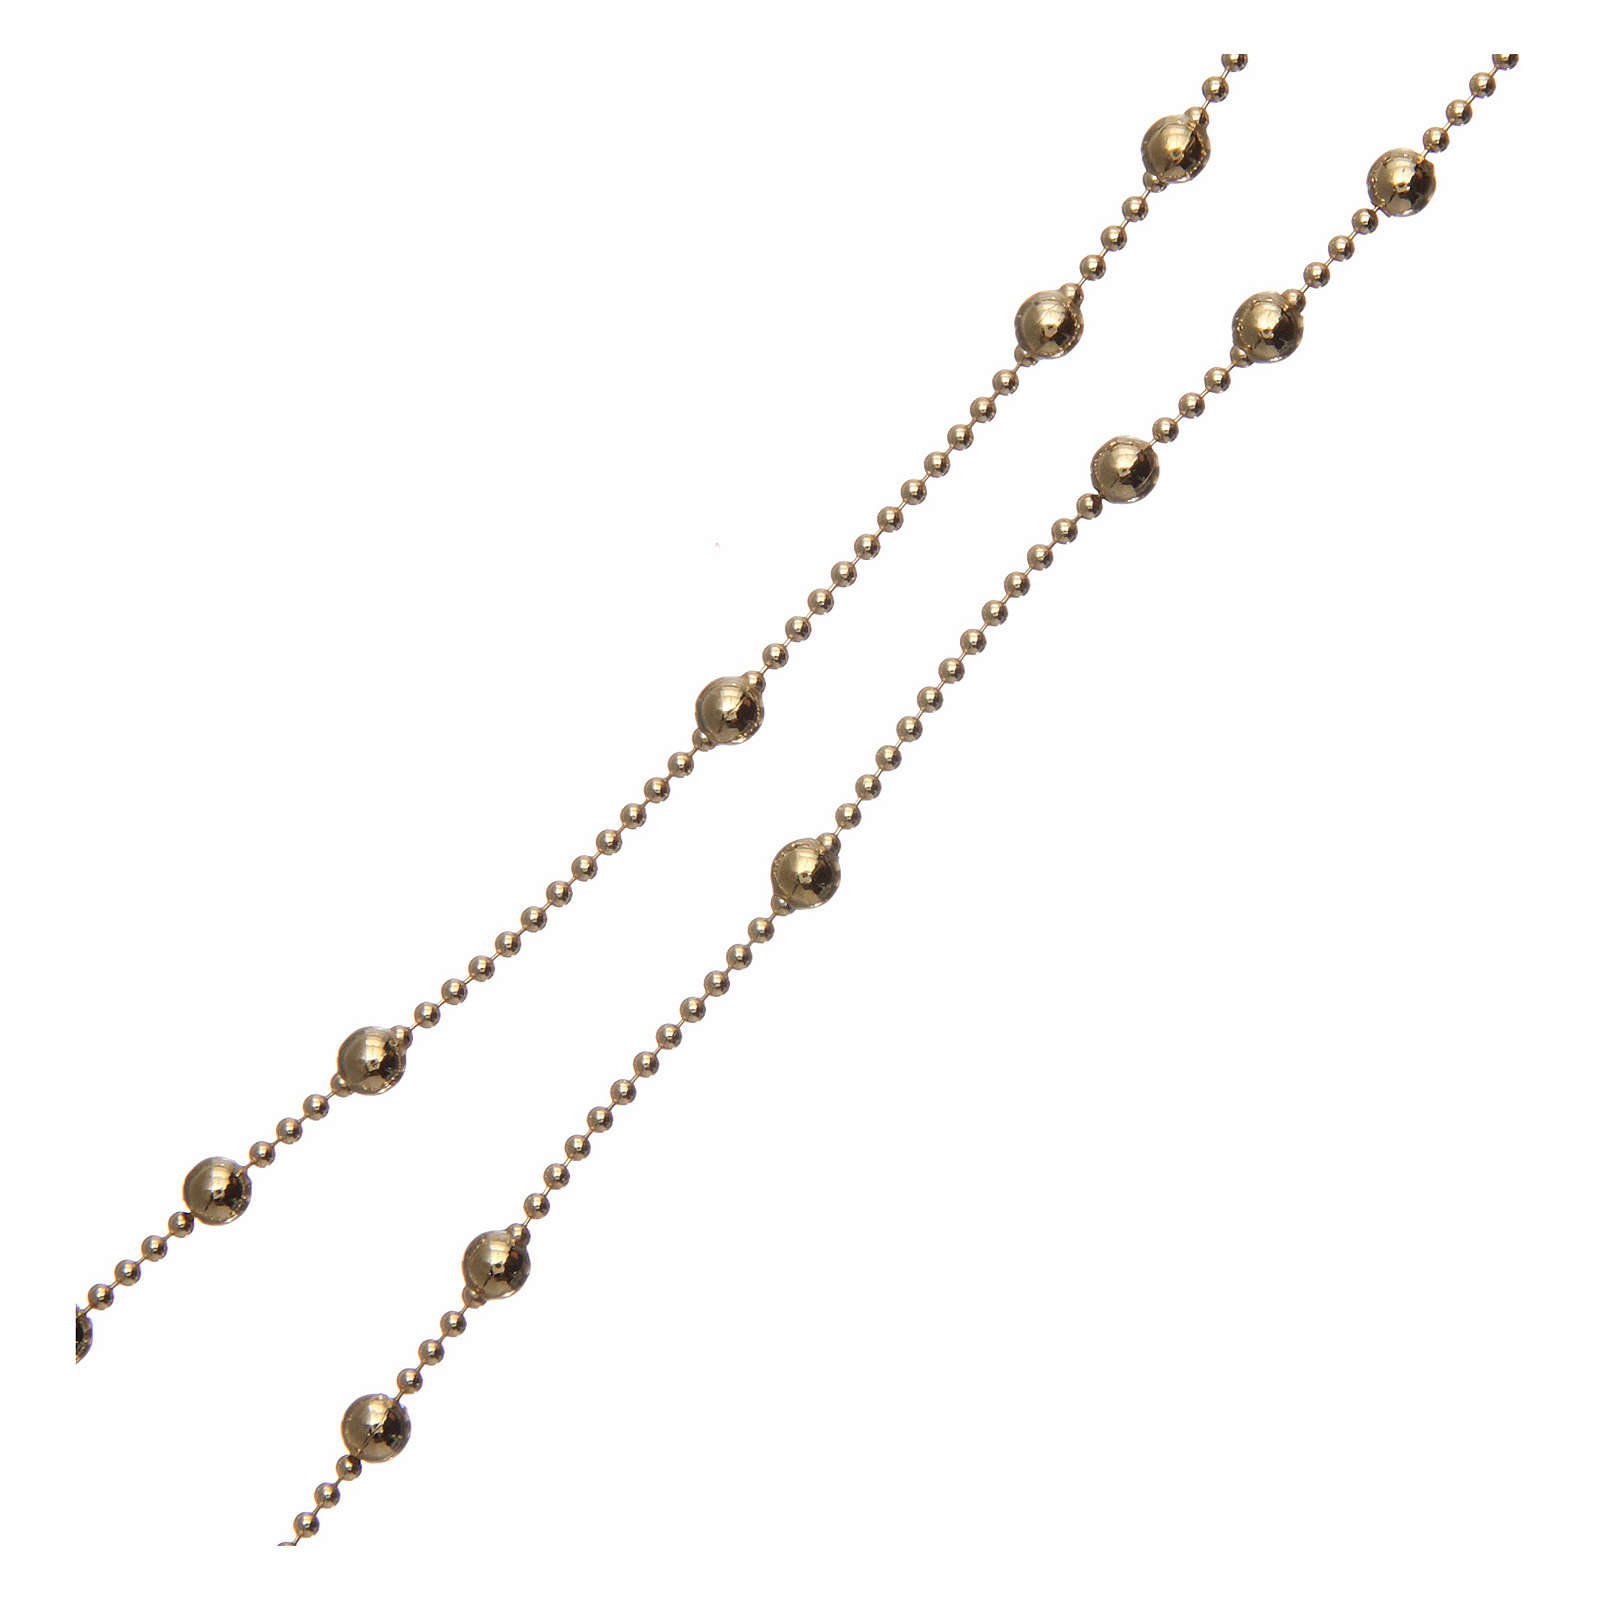 Rosario plata 925 chapada oro granos redondos 3 mm 4